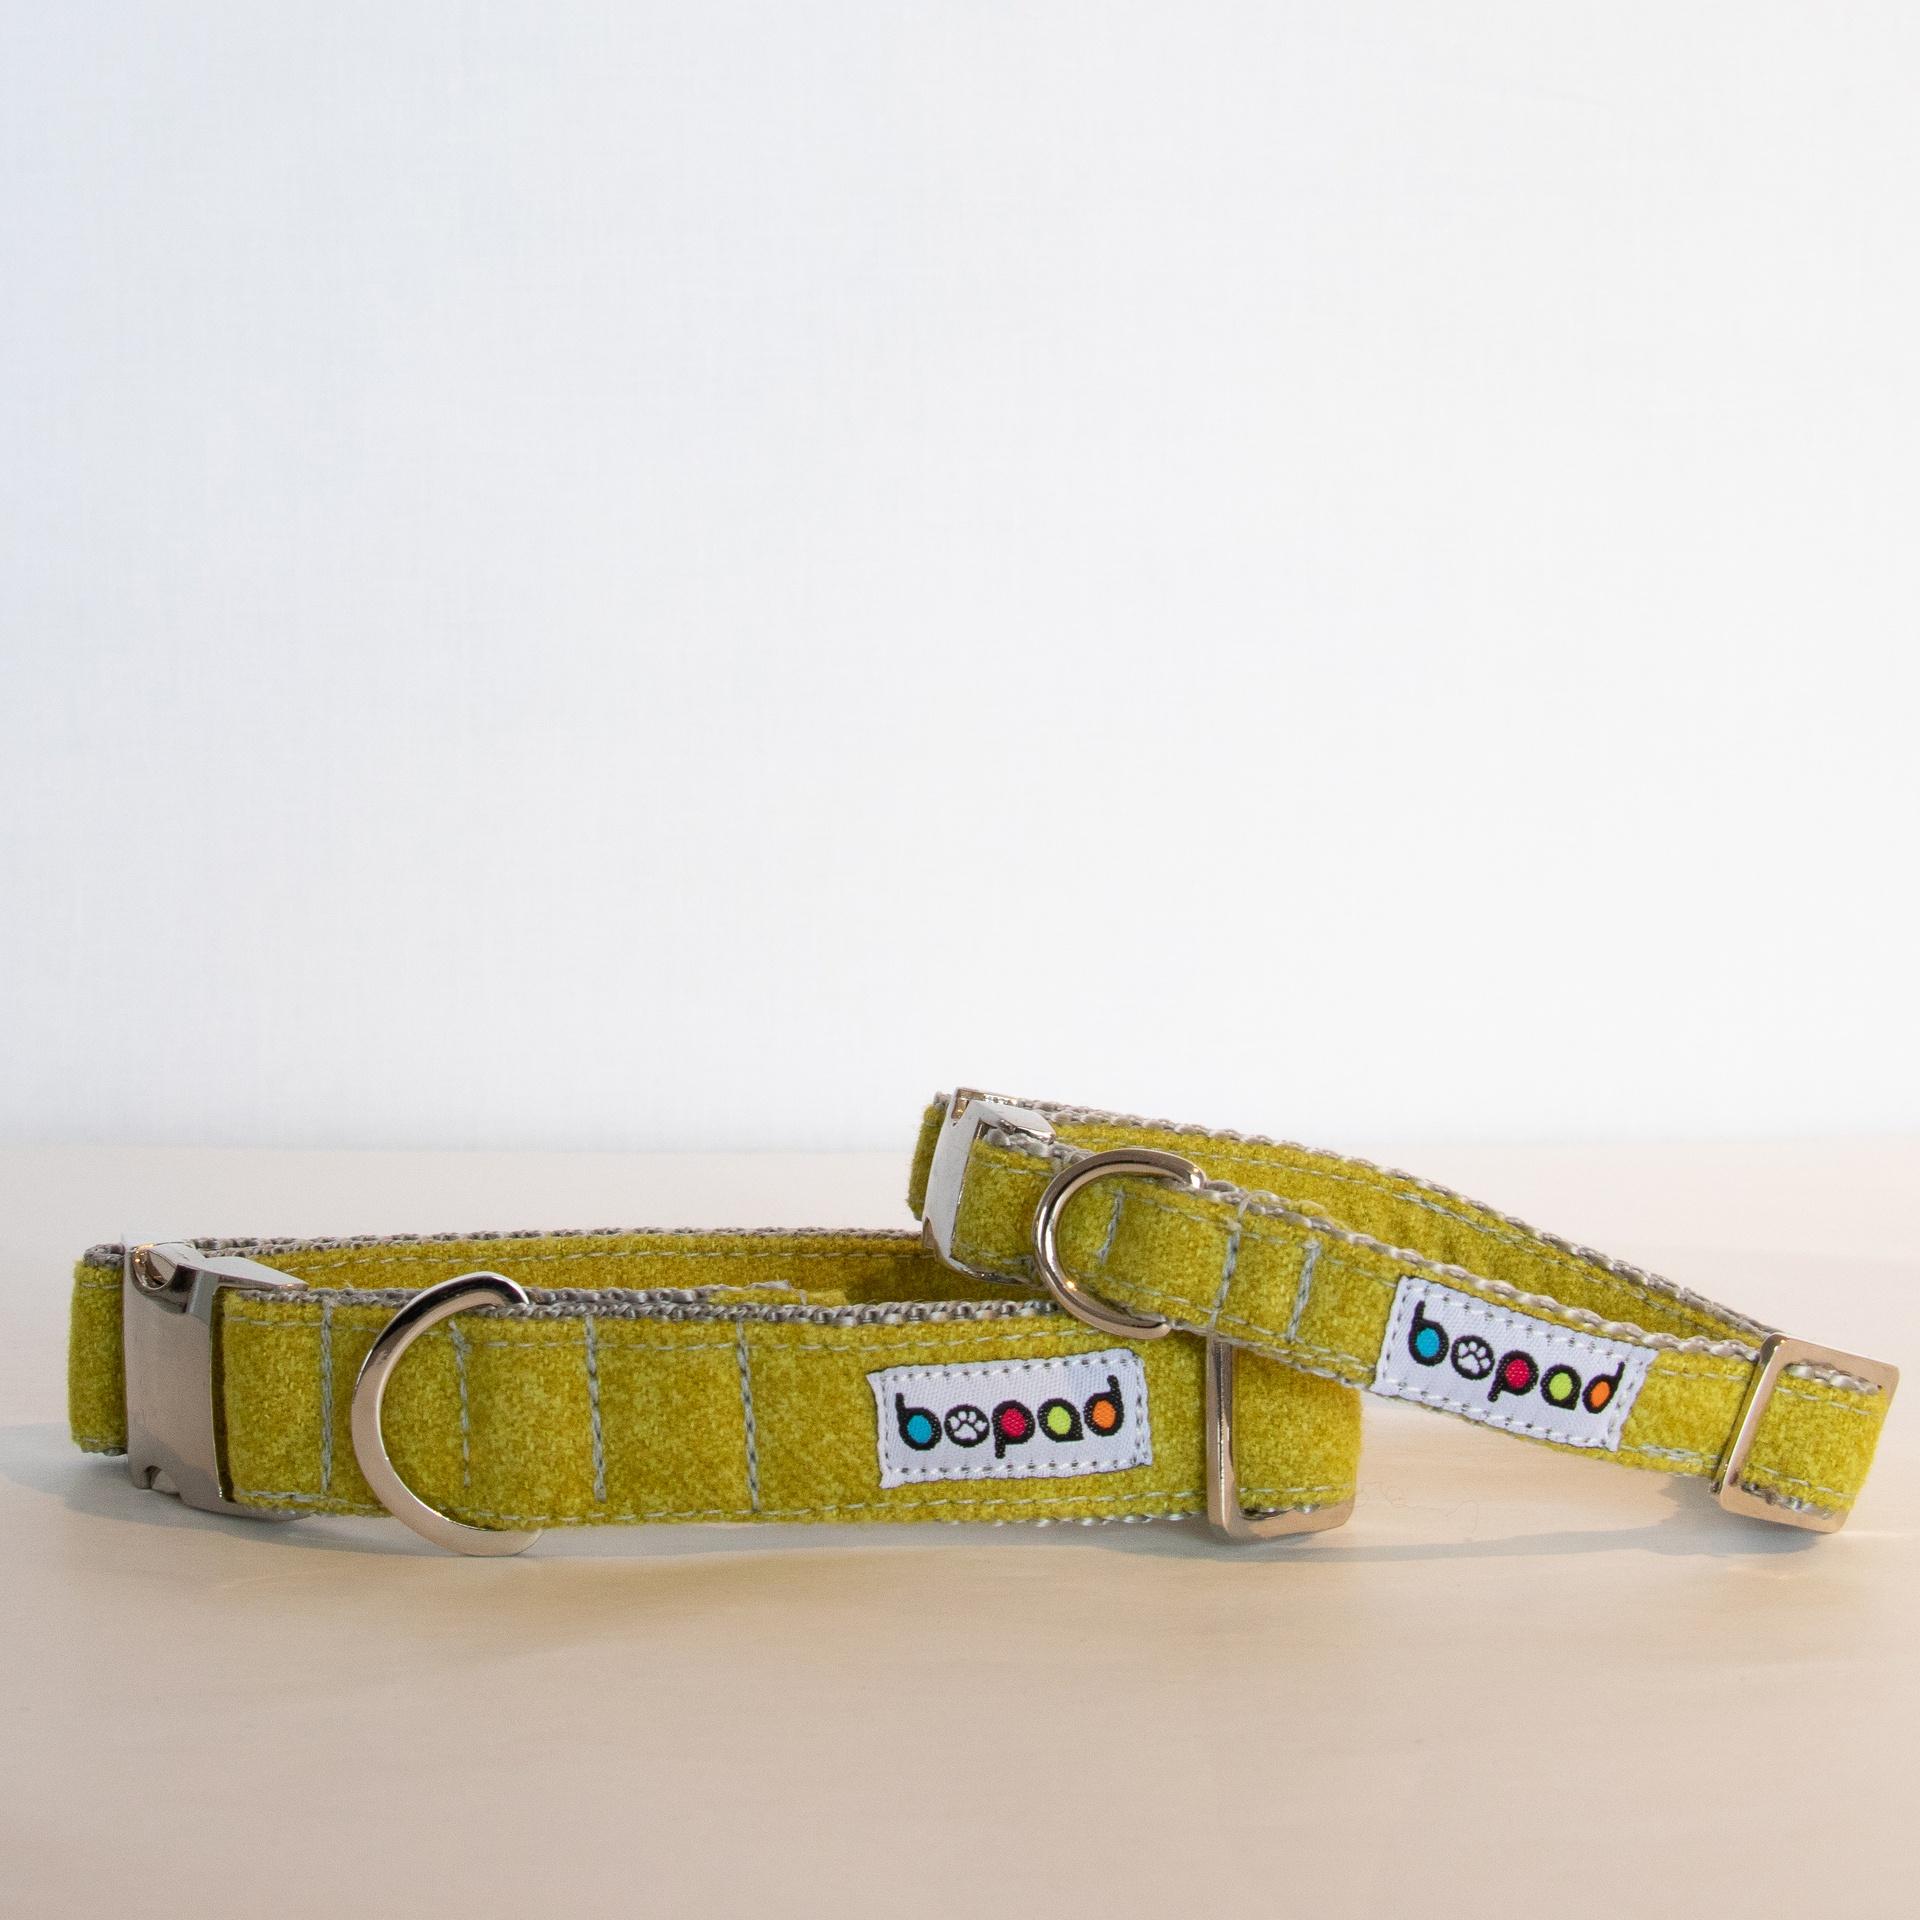 Fabric/Webbing Dog Collars